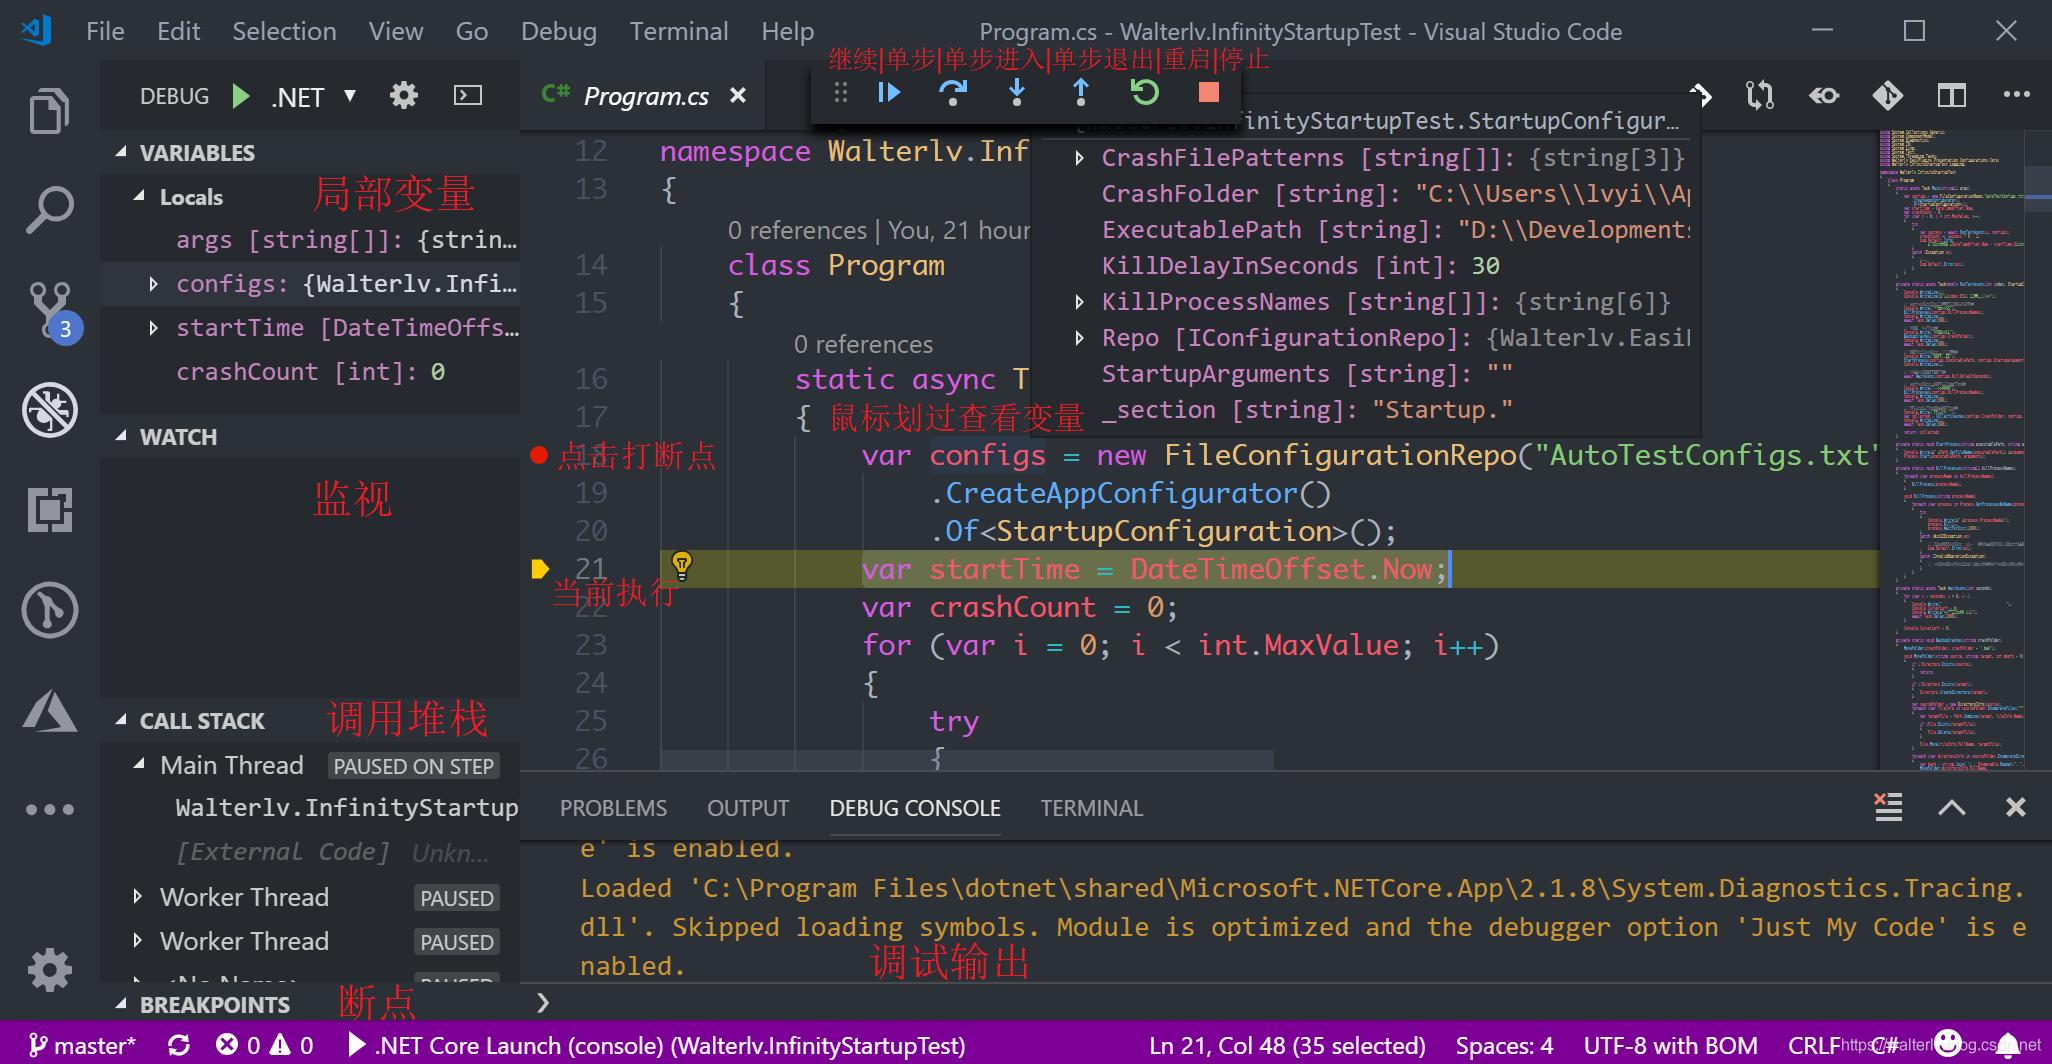 Visual Studio Code 中的 .NET Core 调试界面